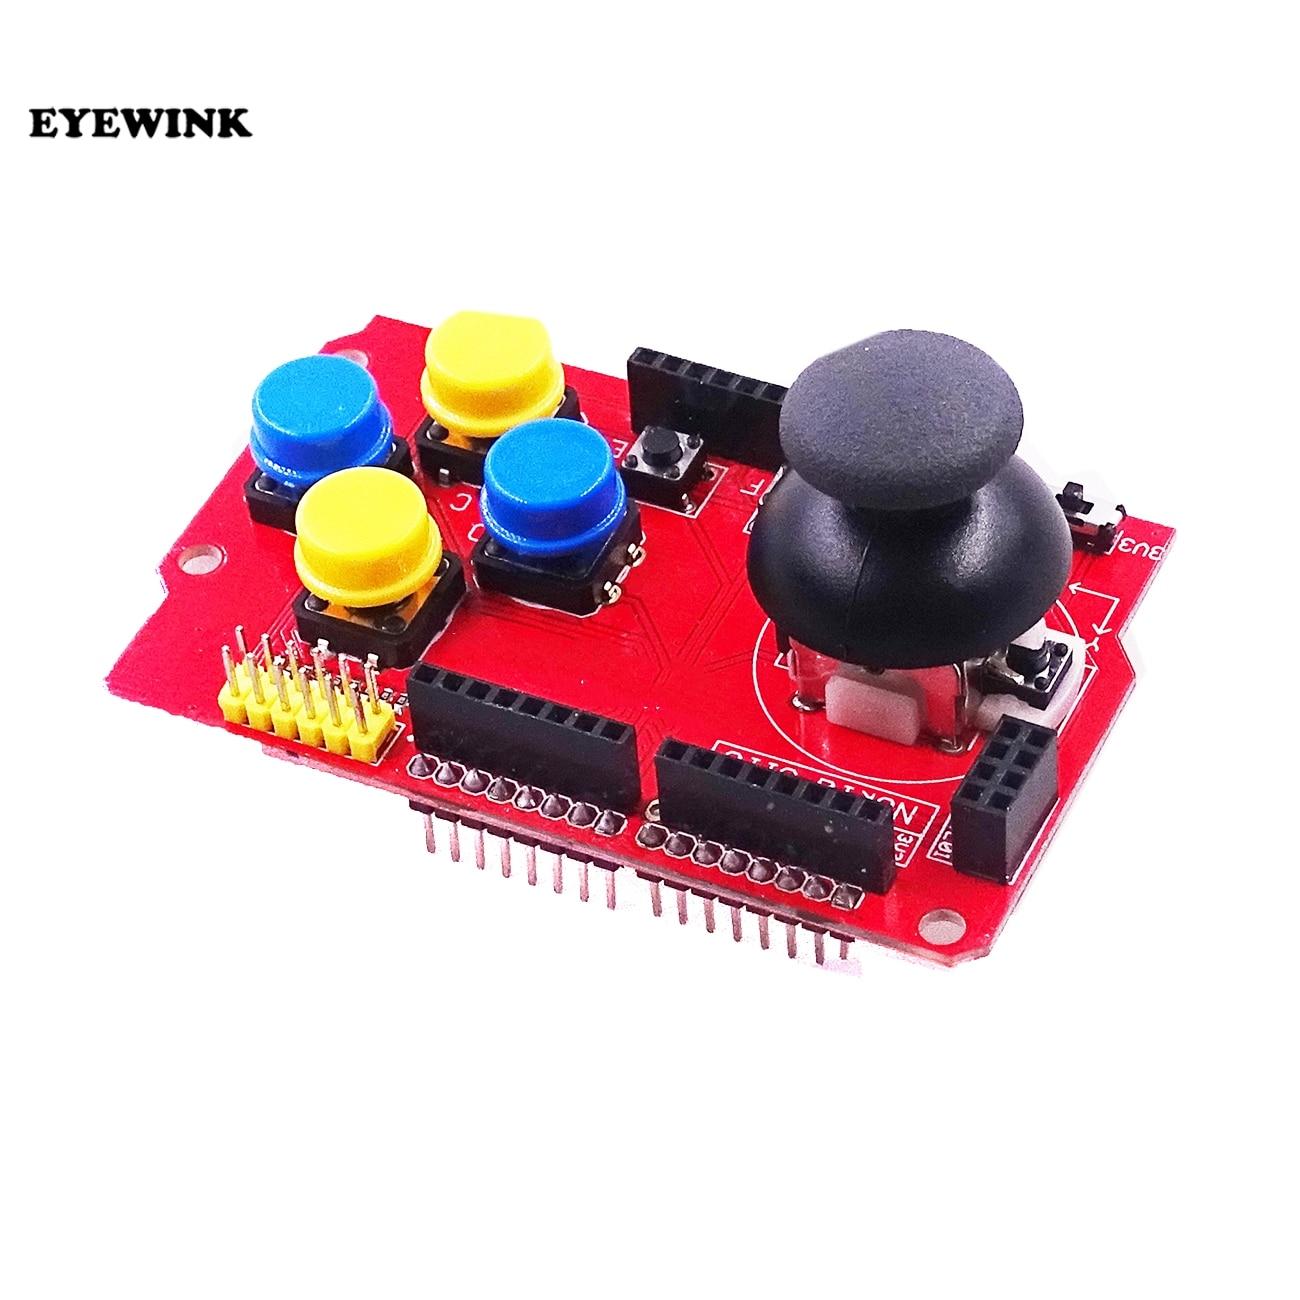 Smart Electronics Integrated Circuit Joystick Shield V1.2 for arduino Diy Kit